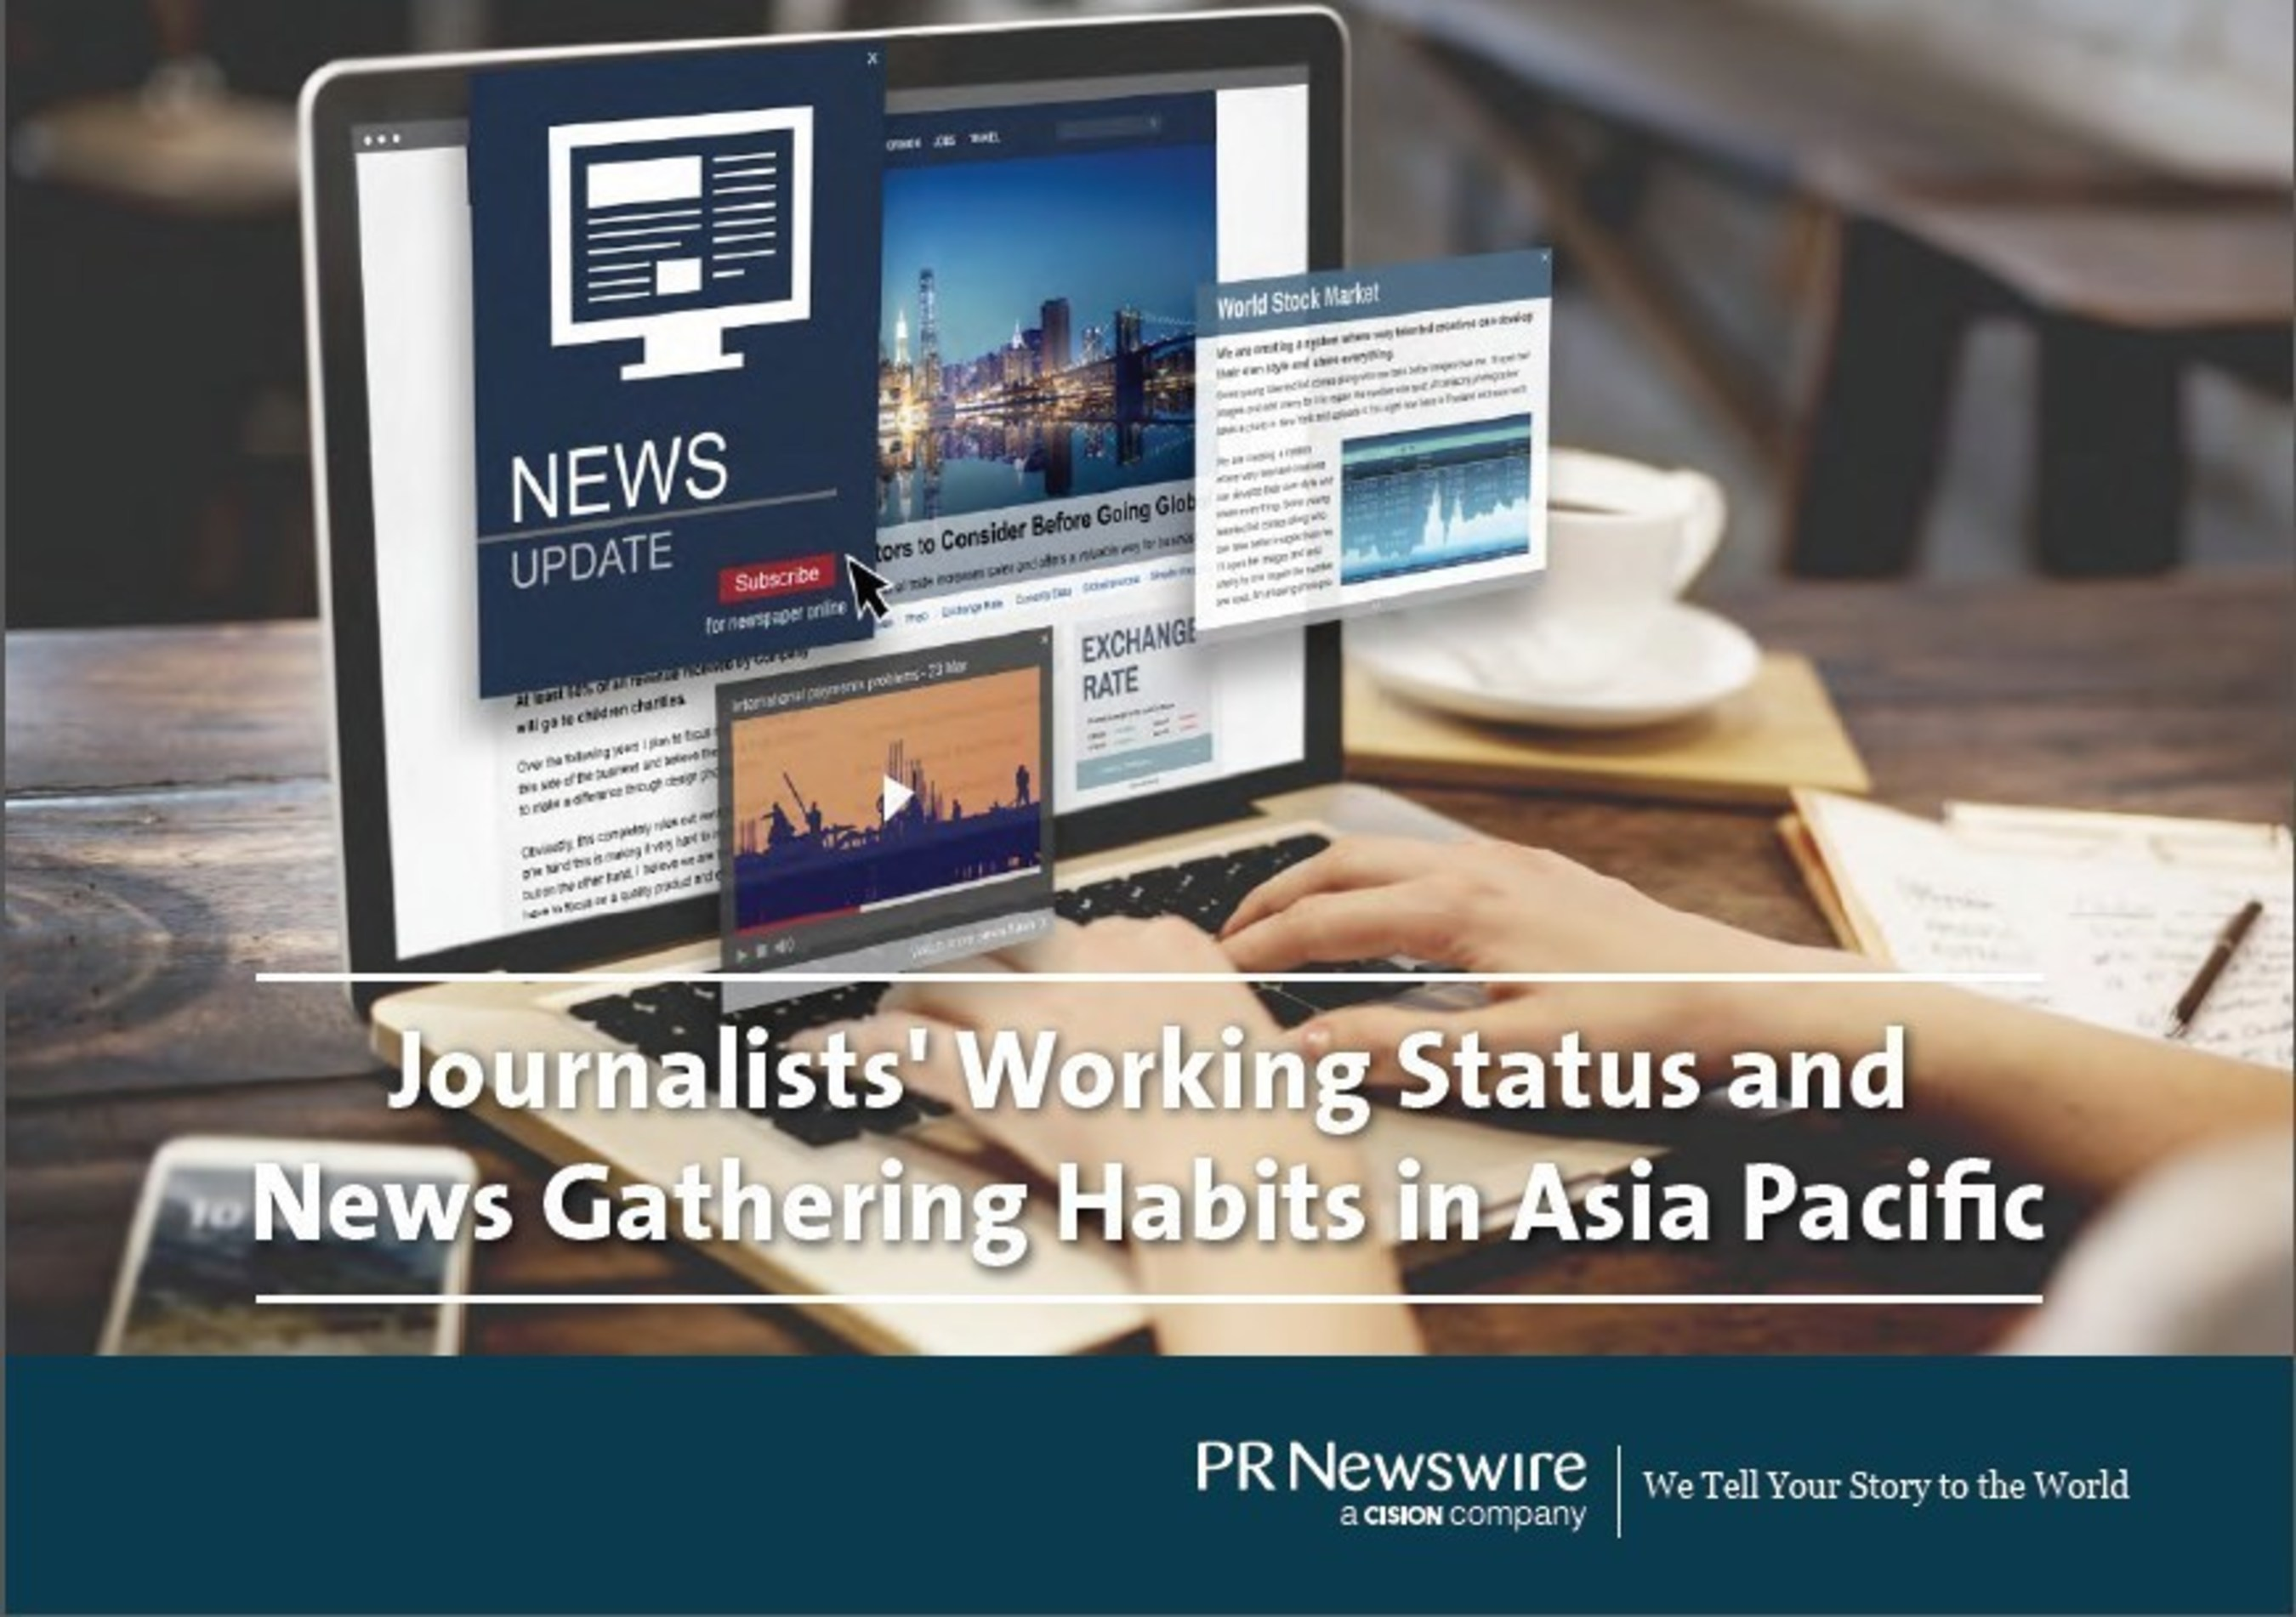 2016 APAC Journalist Survey Report by PR Newswire